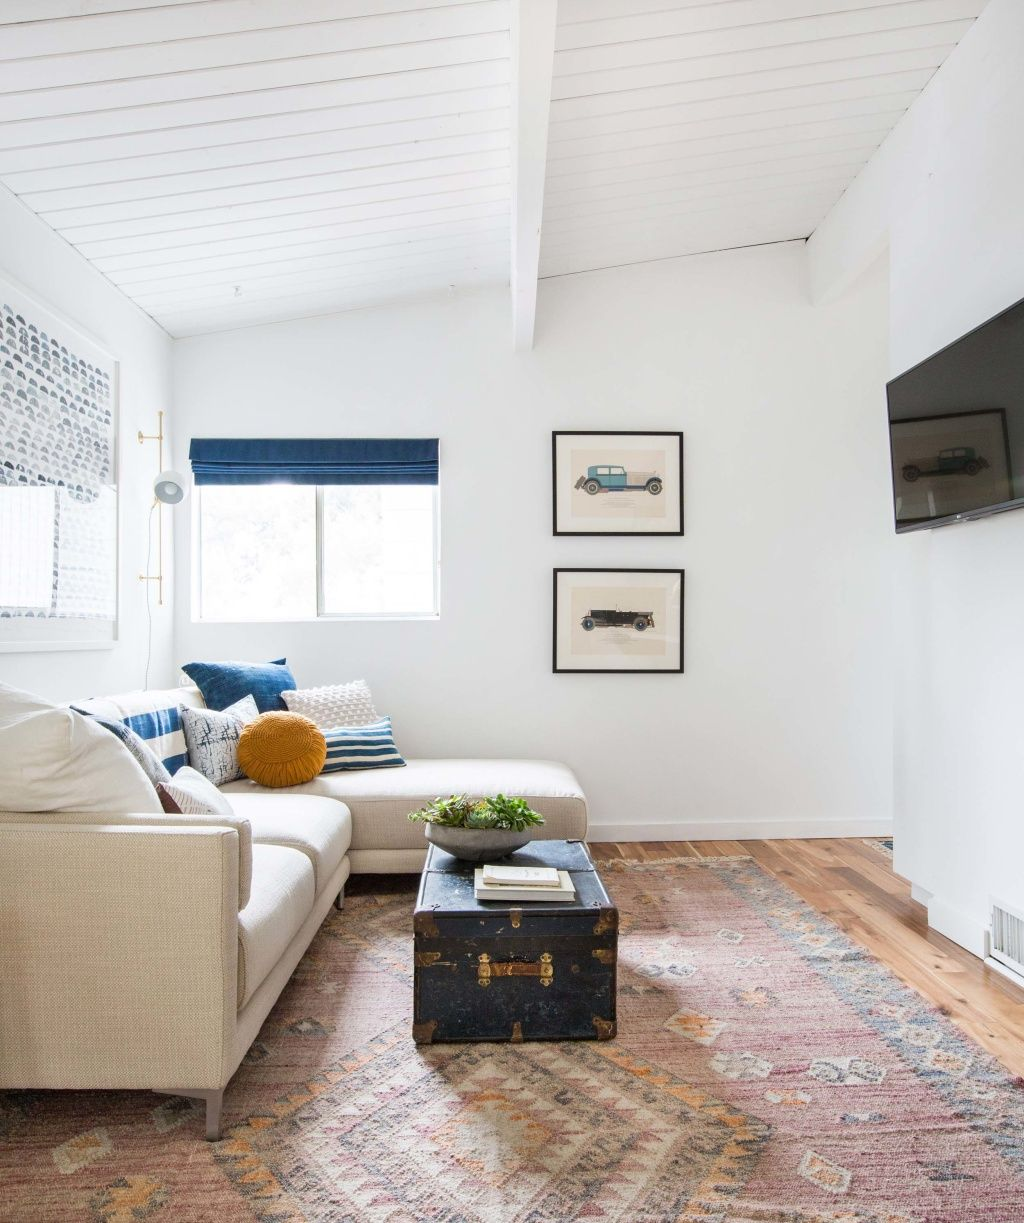 Skyline Flatweave Rug | Flatweave rugs, Apartment living and Room ...